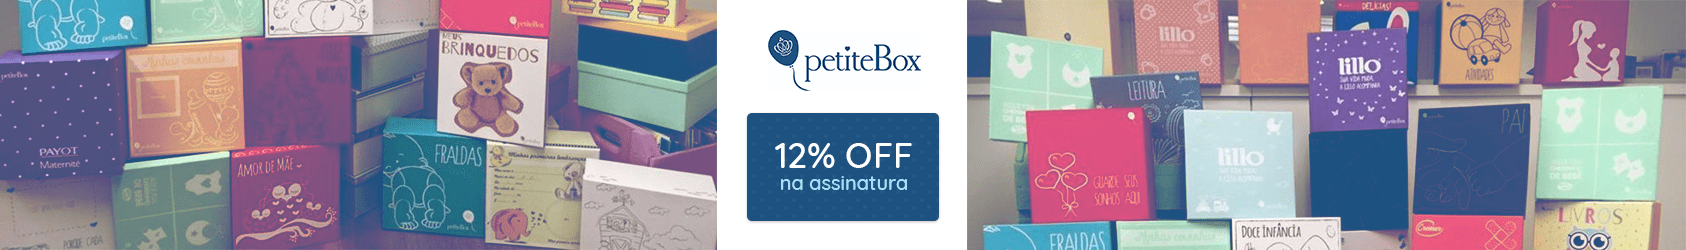 Petite Box